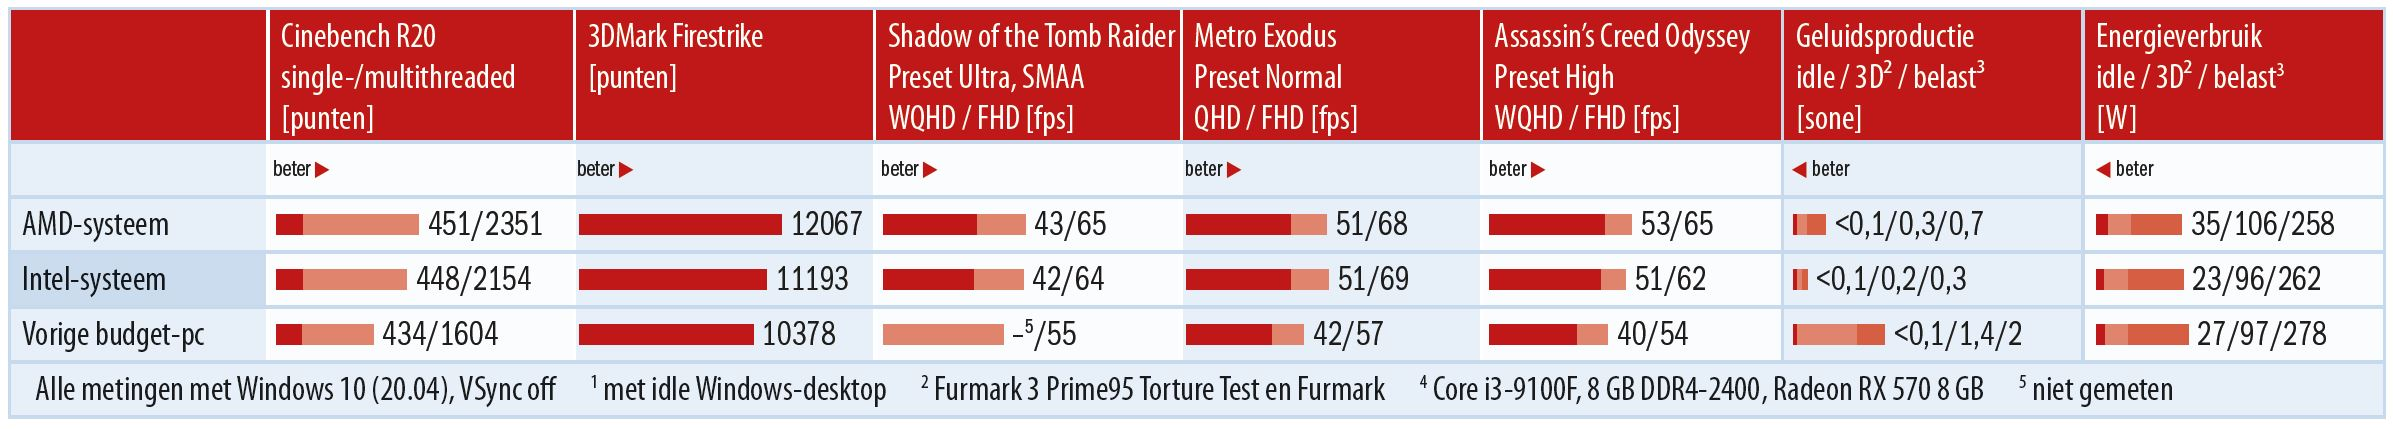 game pc benchmark Intel AMD gaming goedkope gaming pc full-hd energieverbruik geluidsniveau